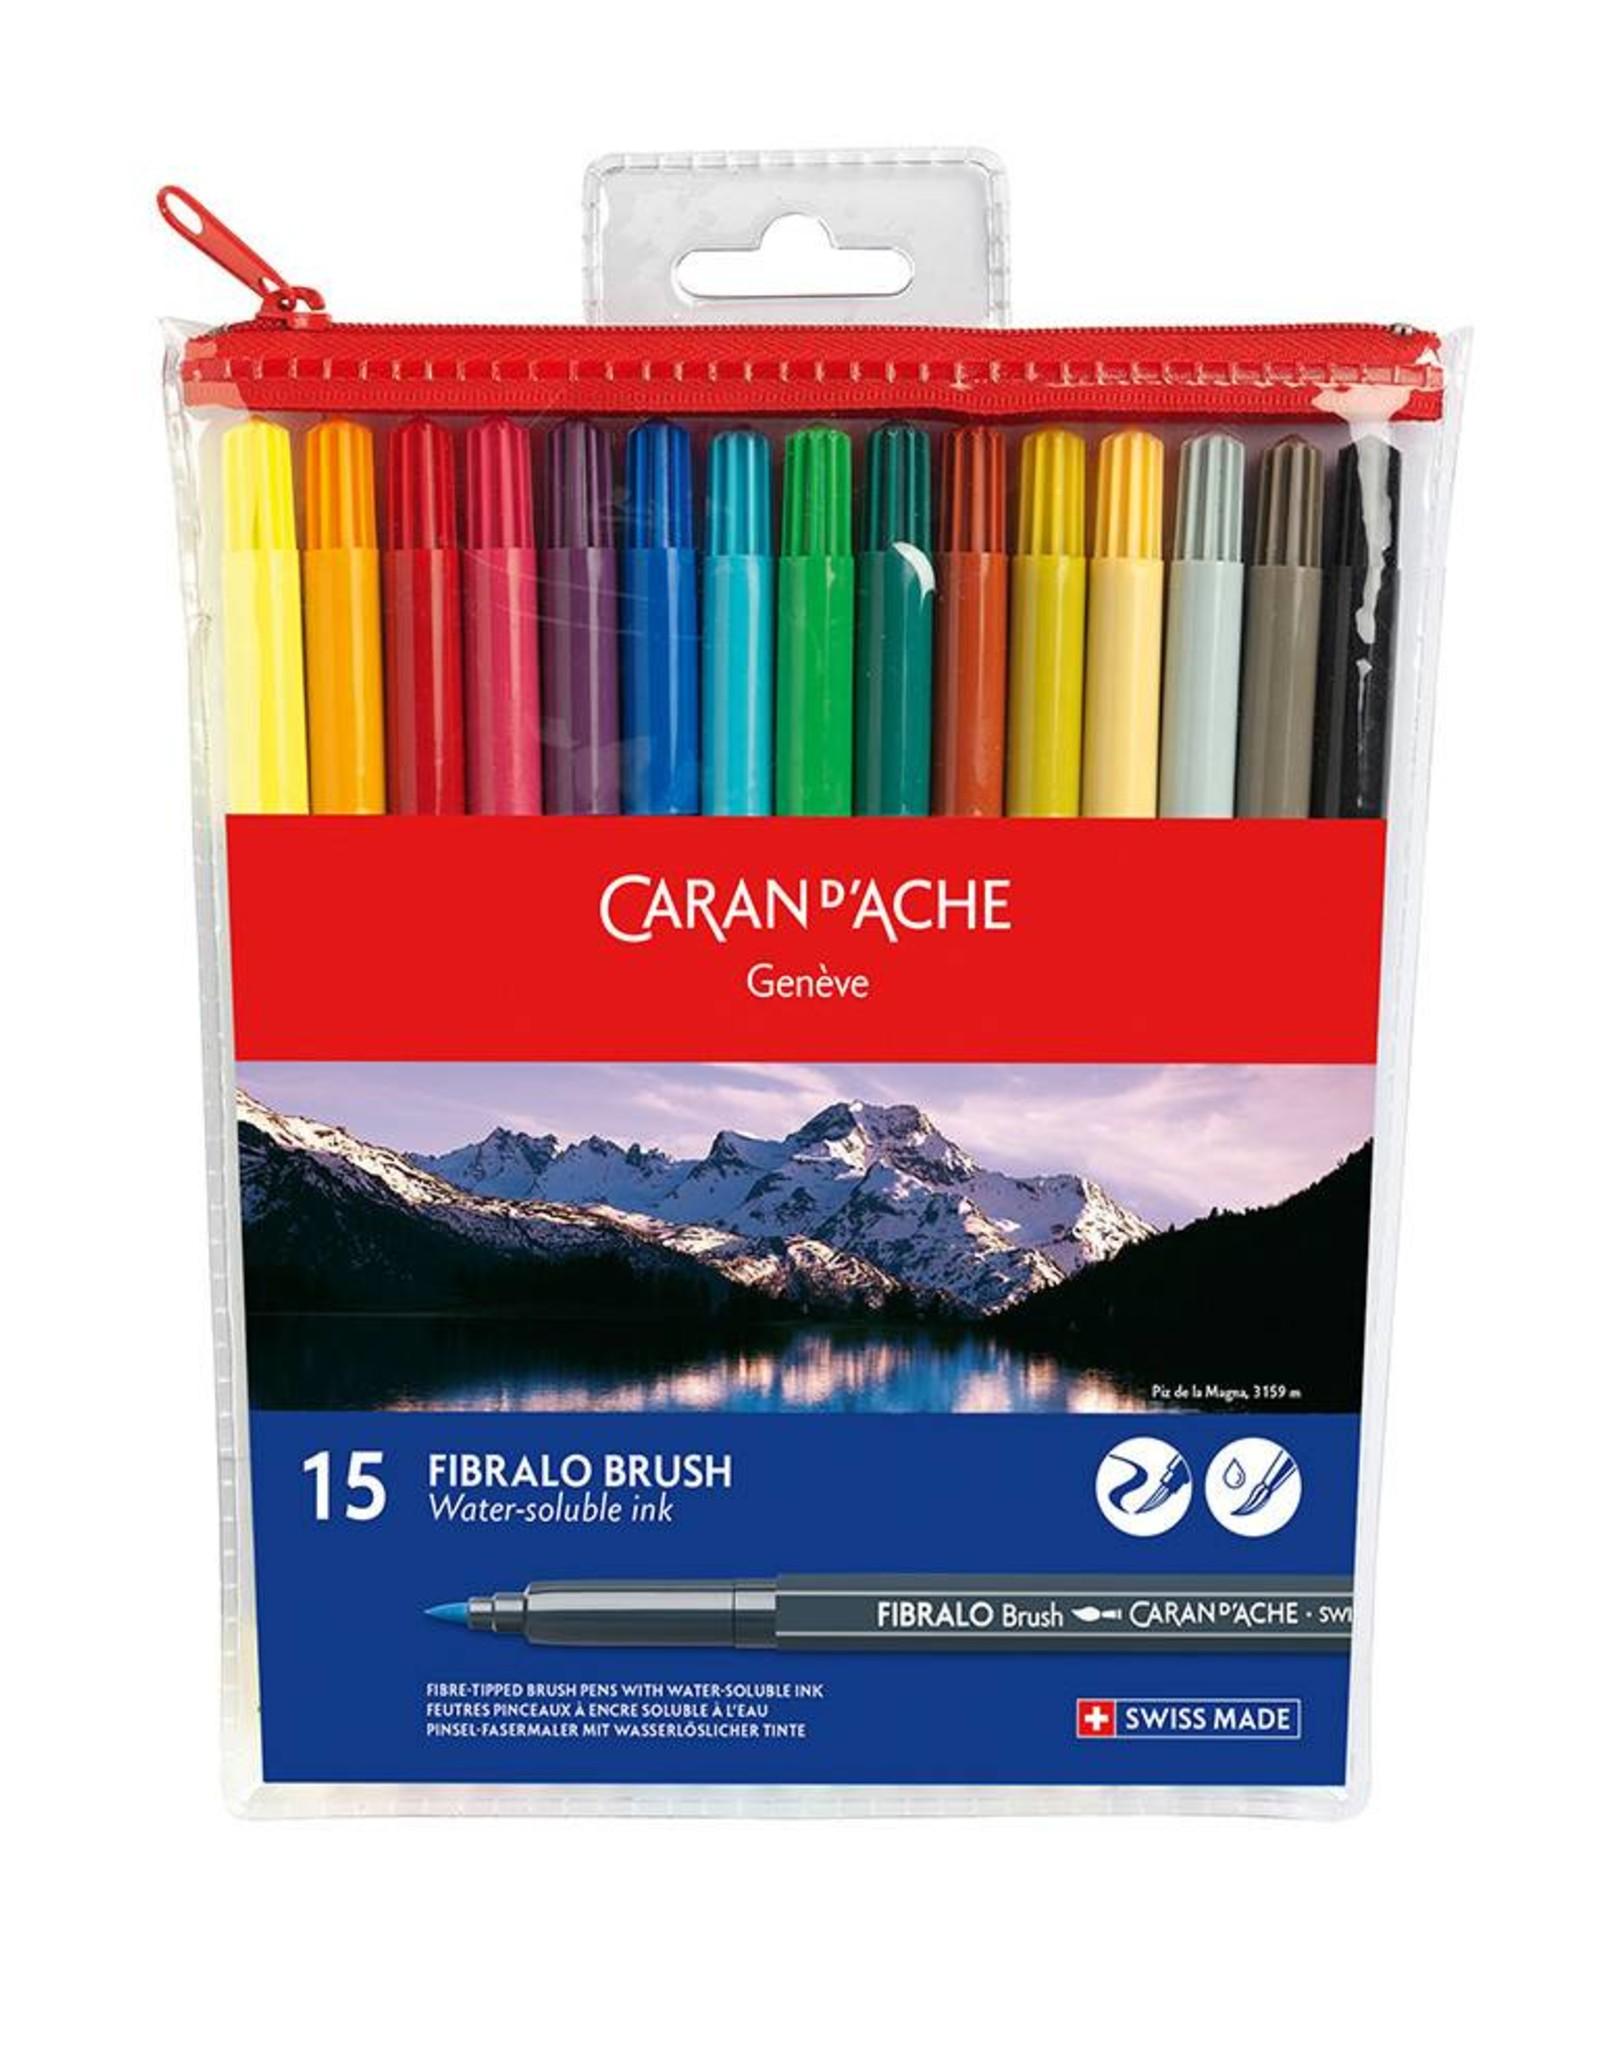 Caran d'Ache Fibralo brush set 15